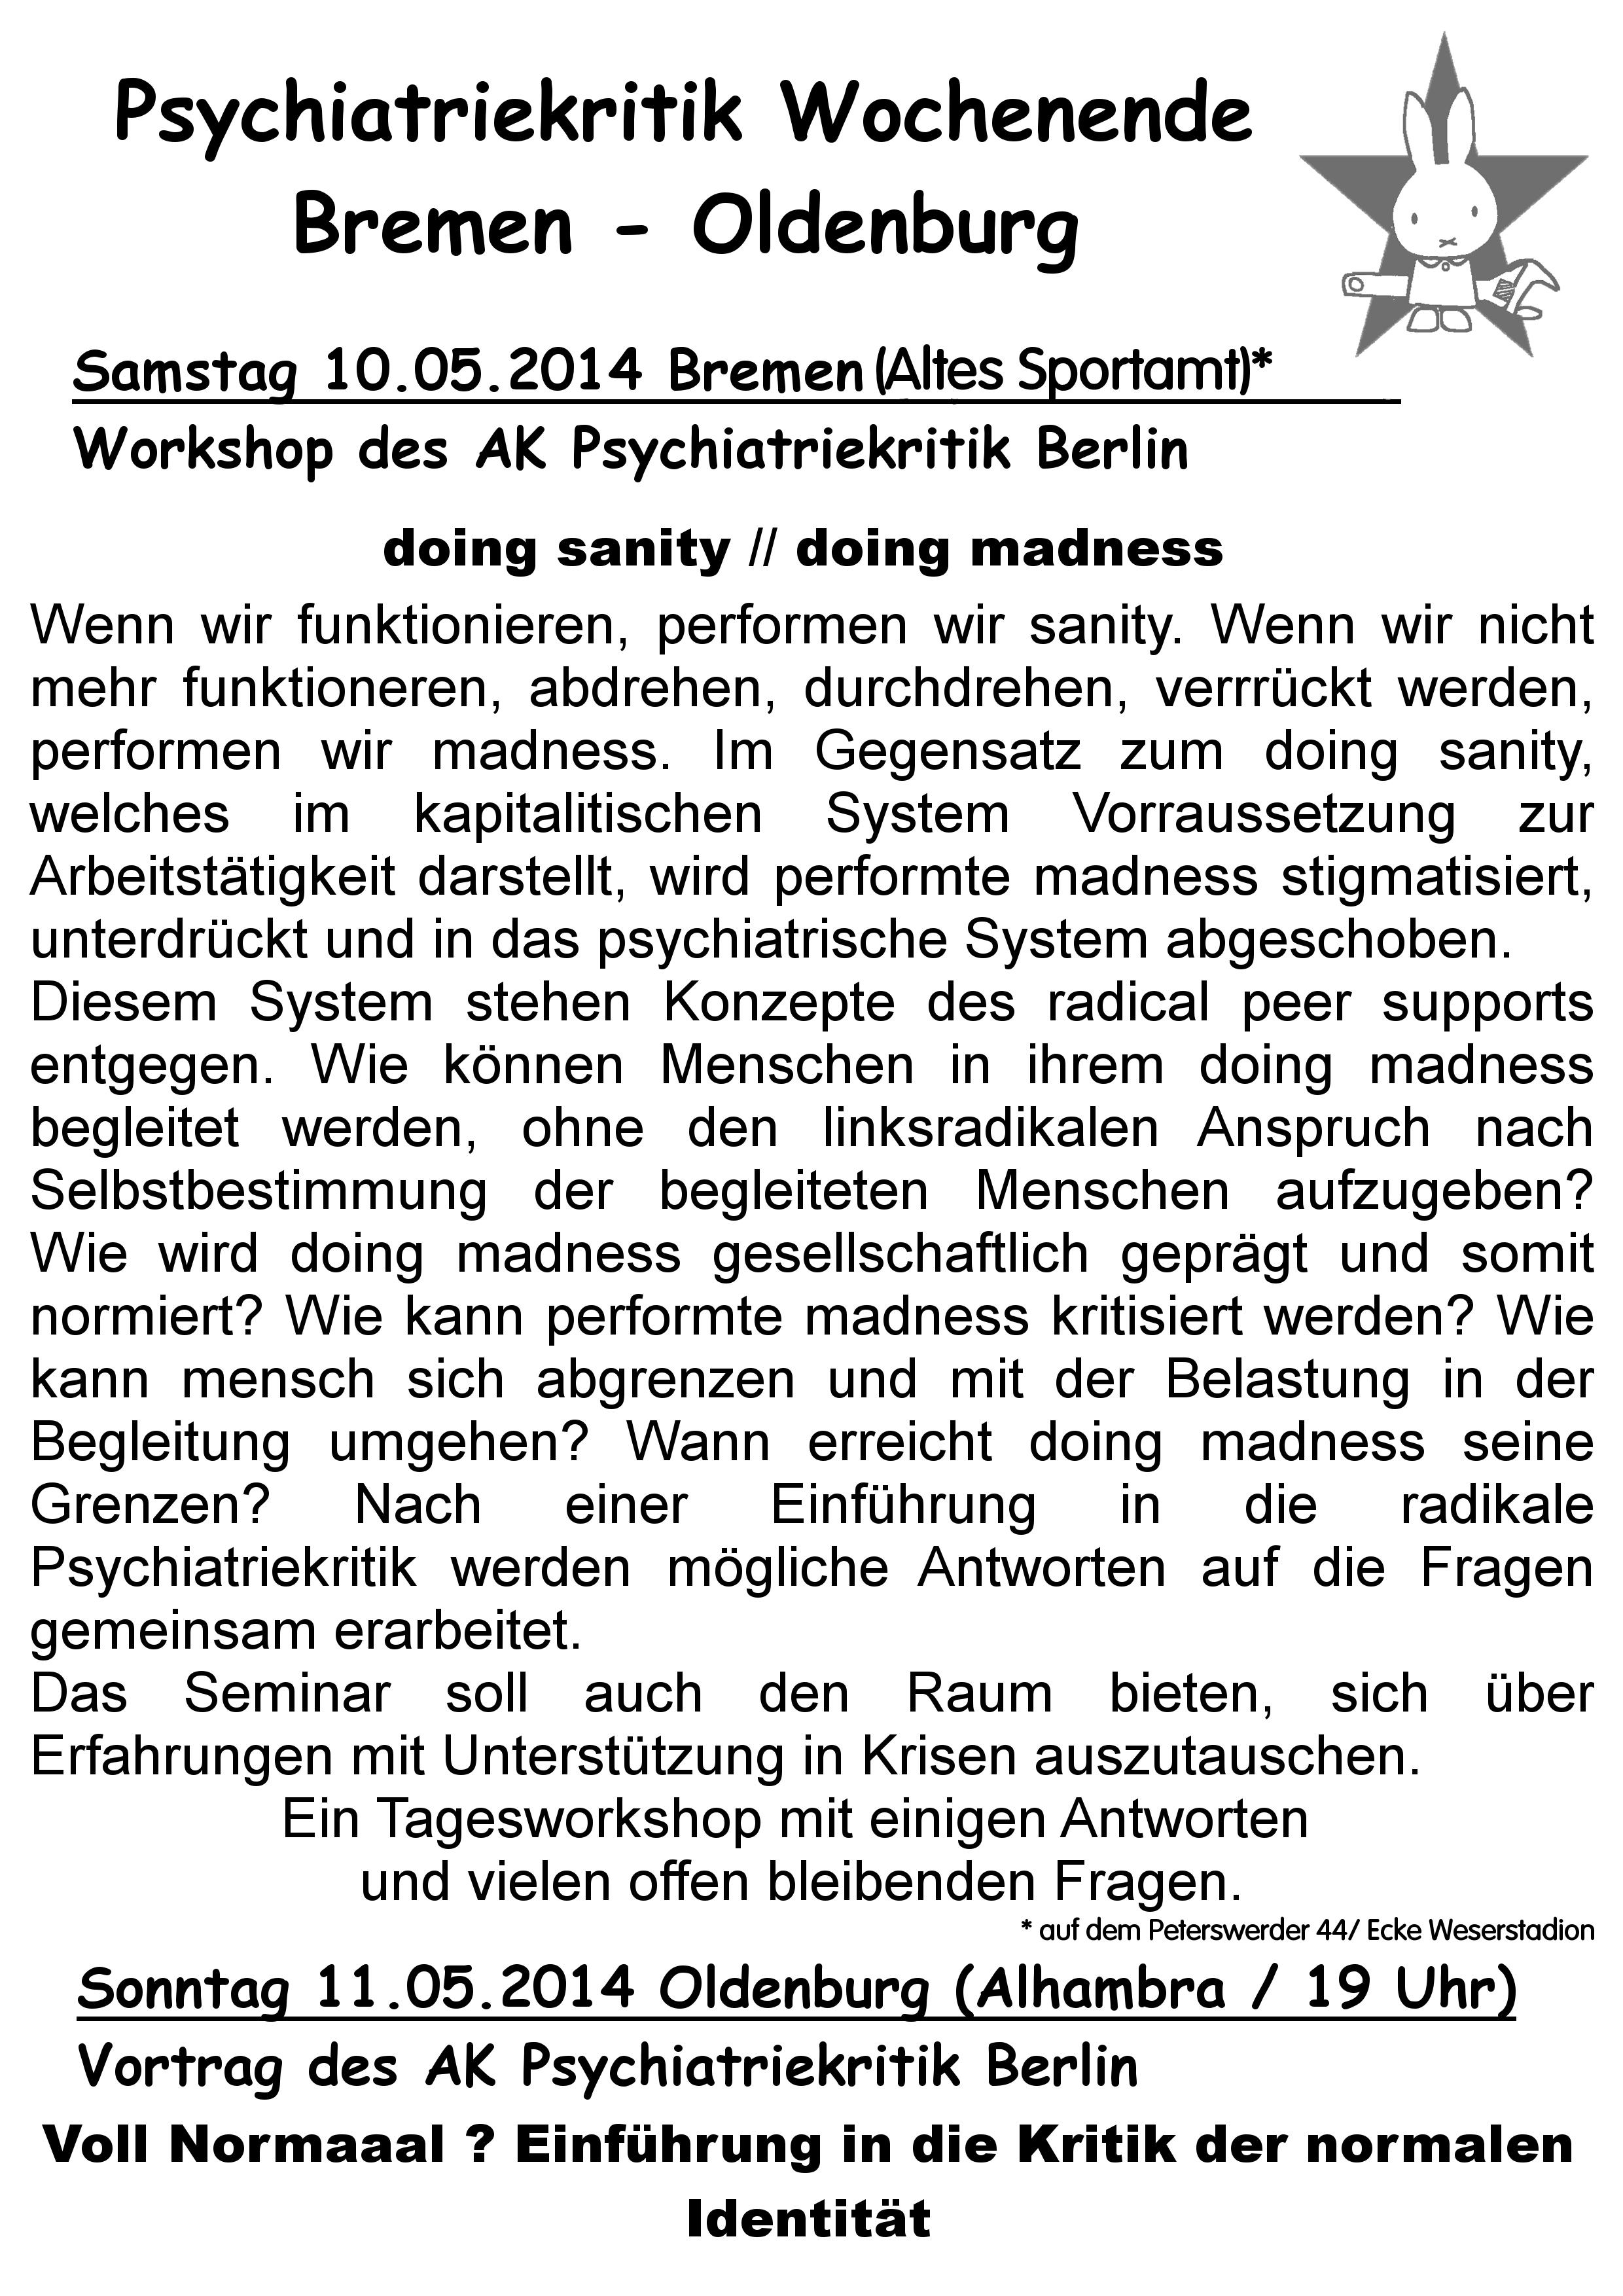 PsychiatrieKritik2